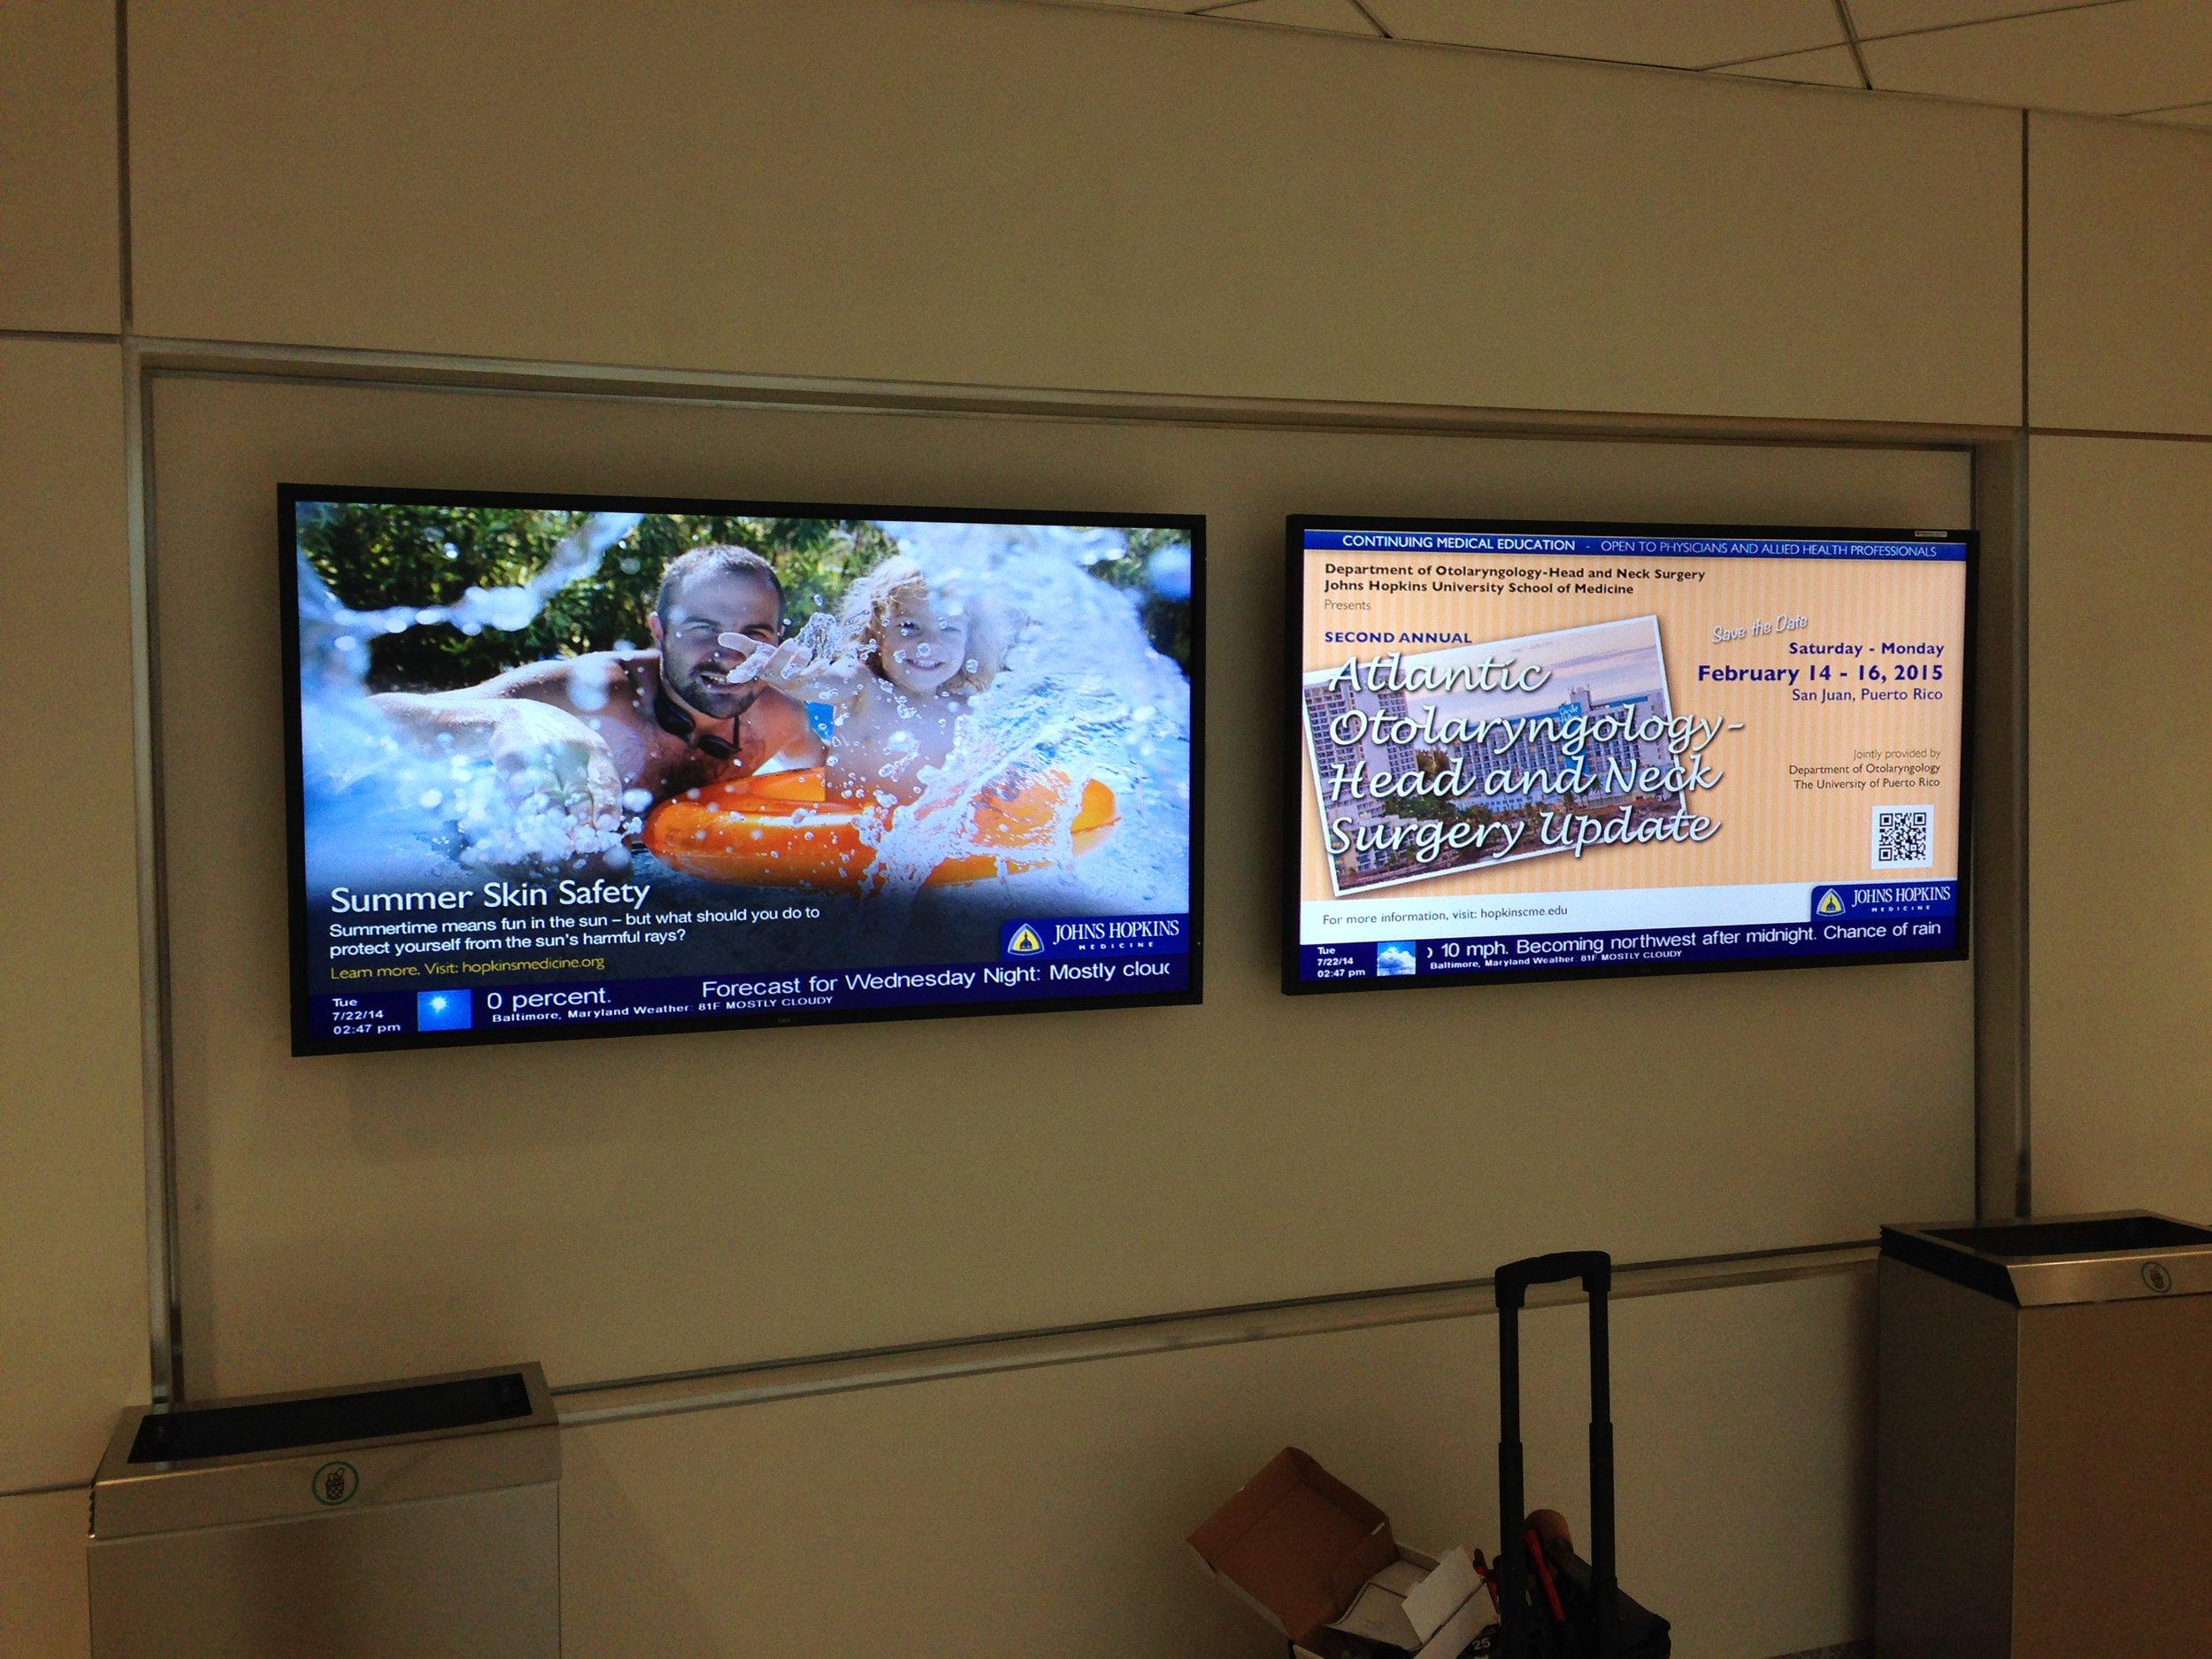 jh hospital nelson lobby (digital signage).jpg